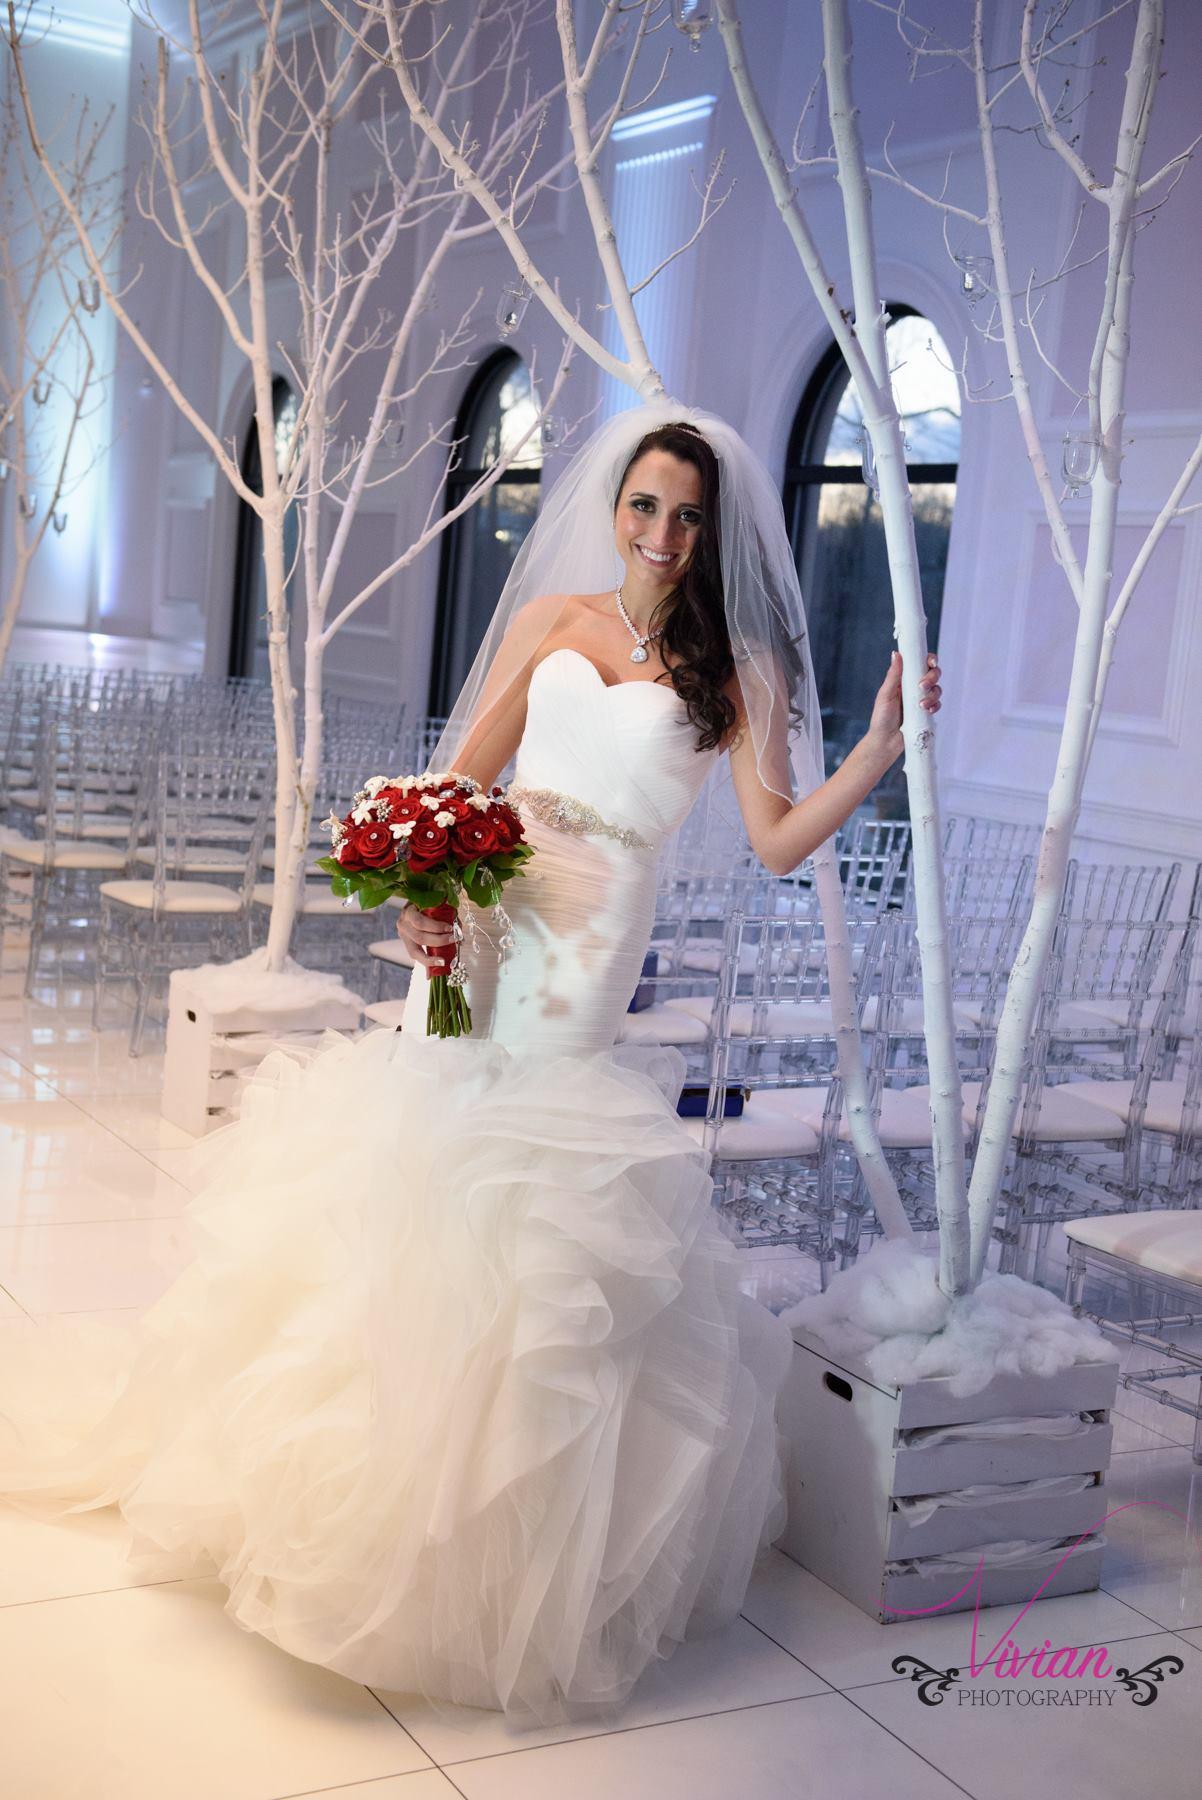 bride-posing-in-winter-wonderland-wedding-venue.jpg